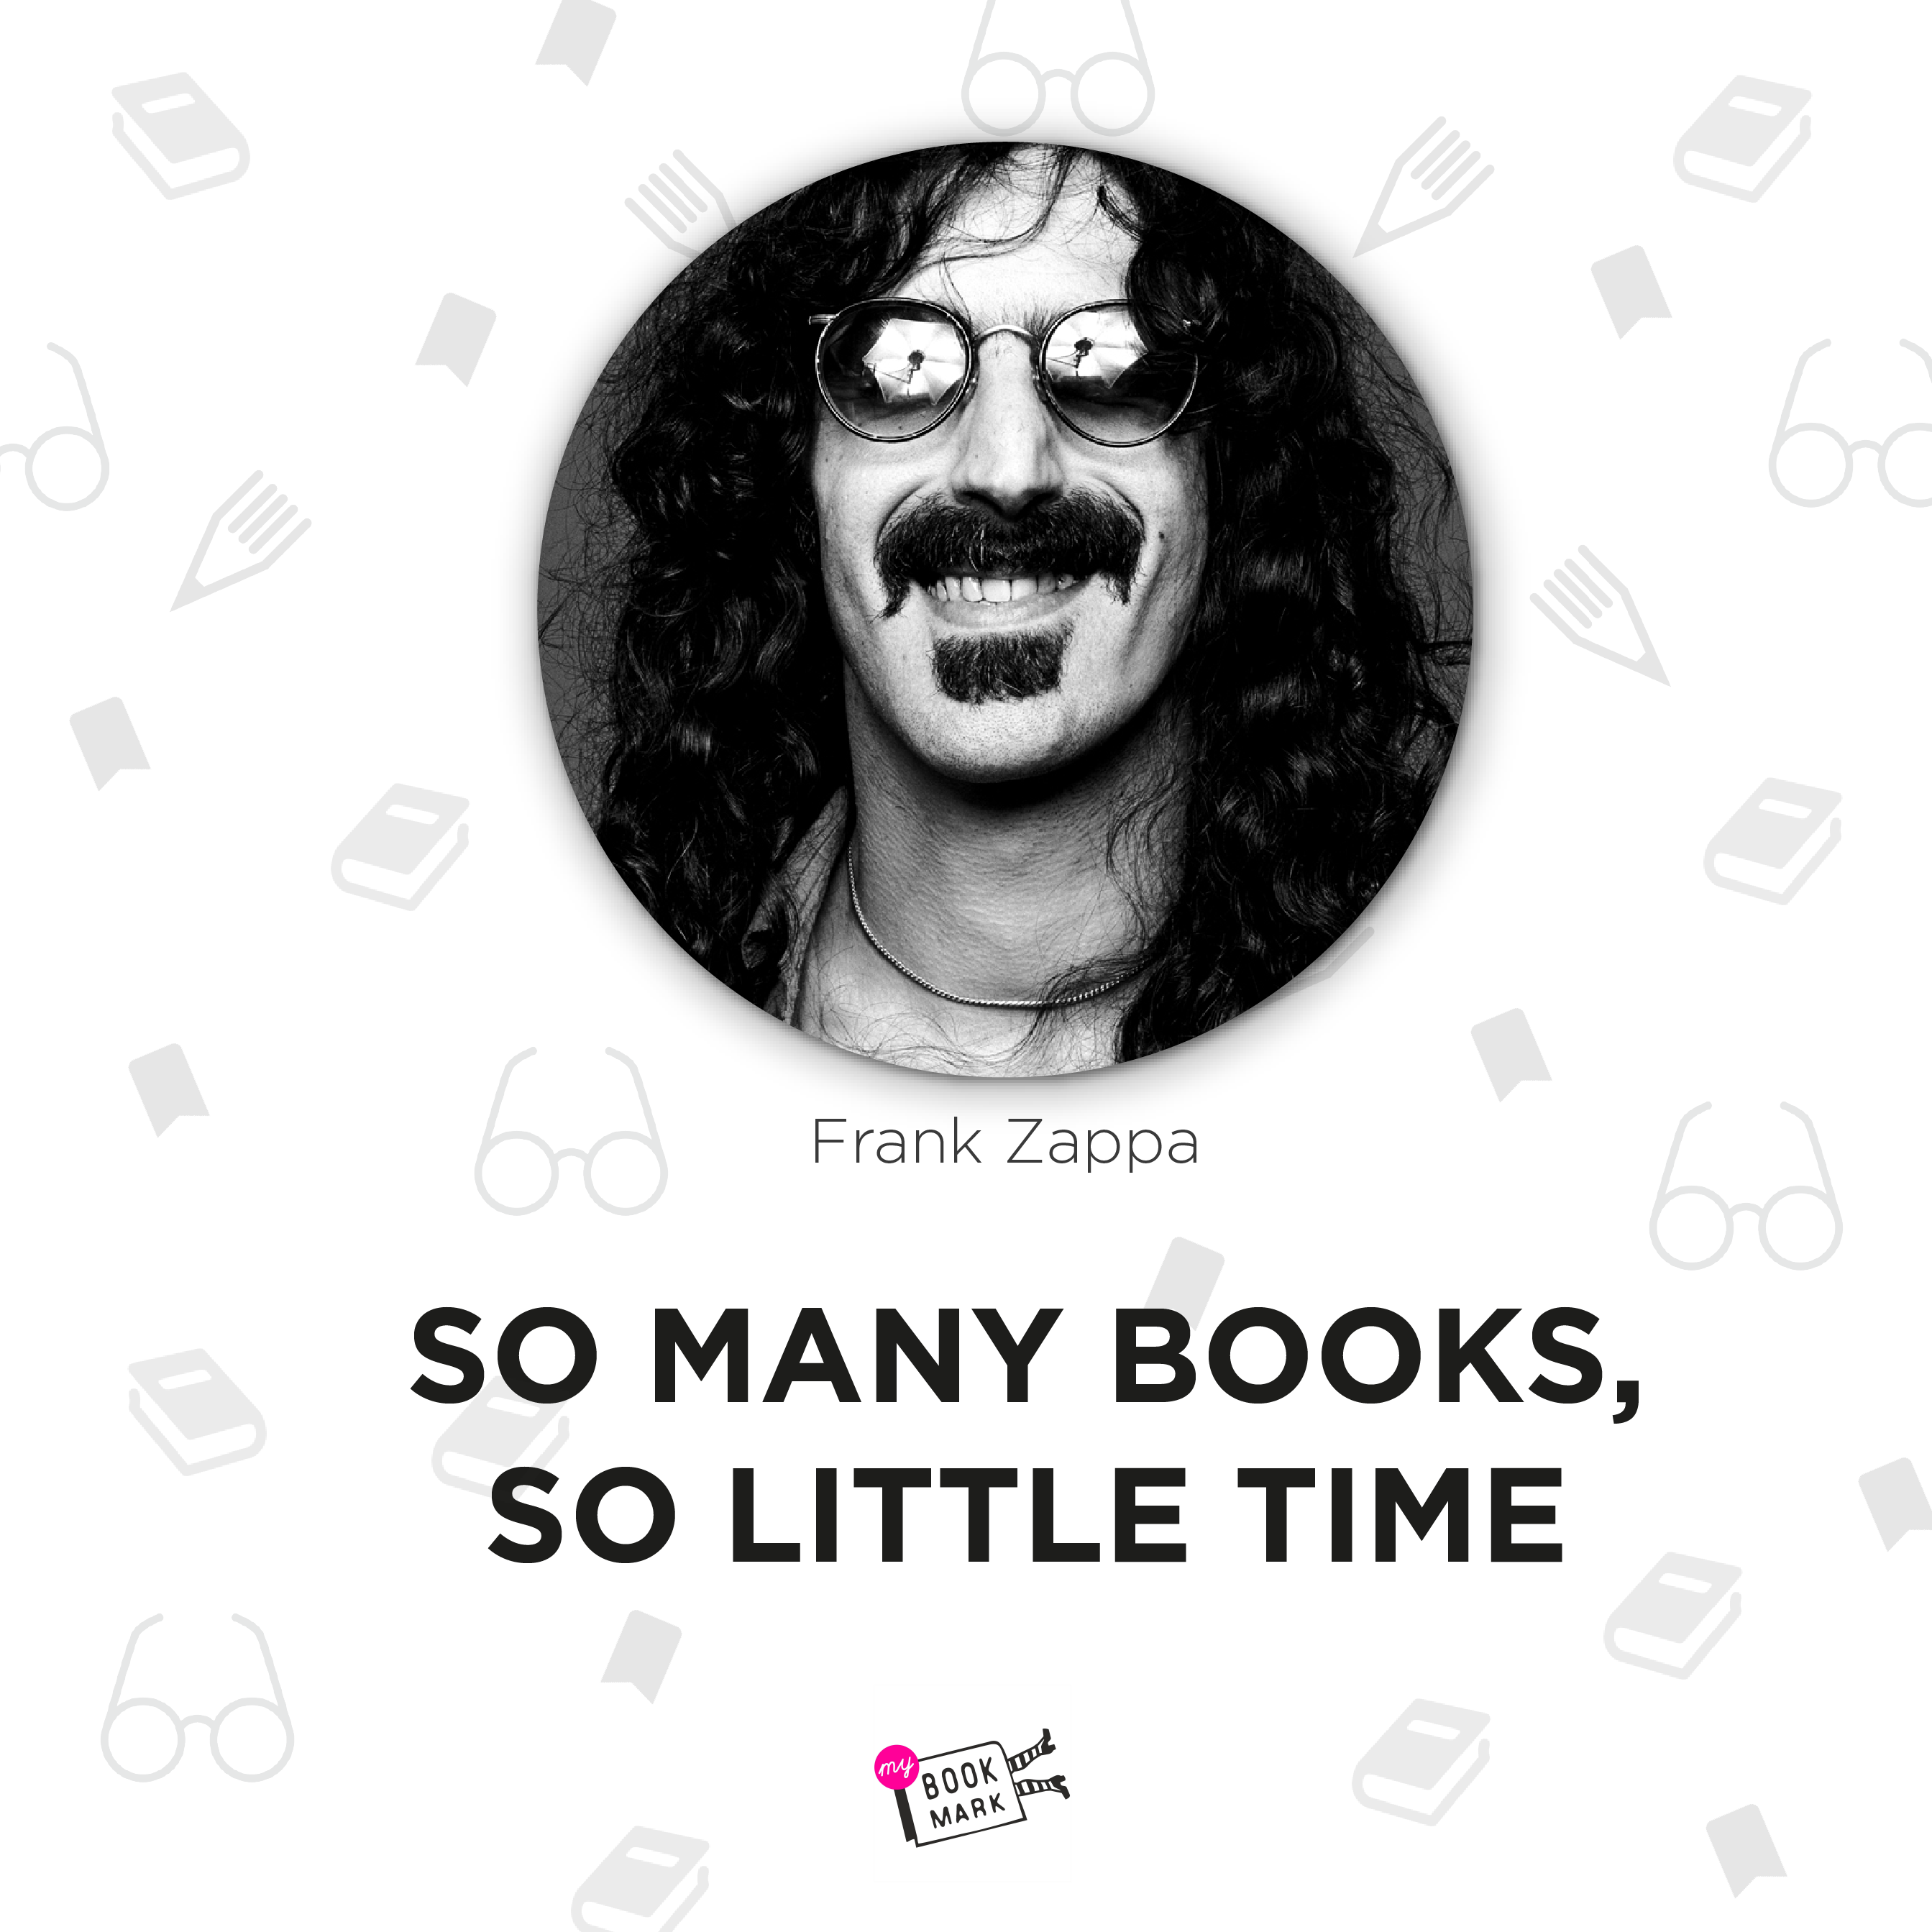 Frank Zappa - famous American singer about books www.mybookmark.etsy.com  #mybookmark